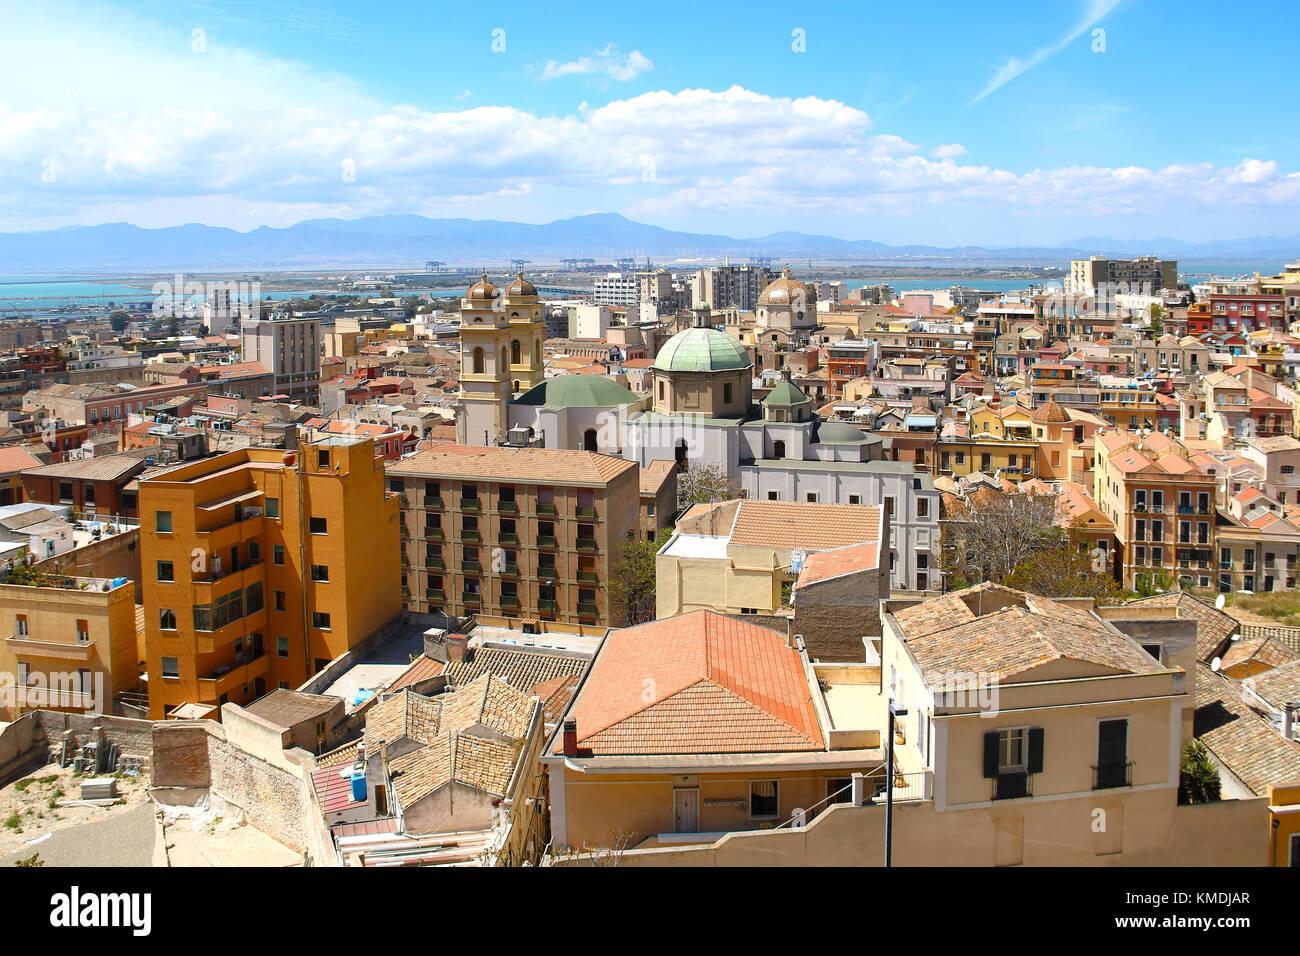 Stadtbild von Cagliari, Sardinien, Italien Stockbild